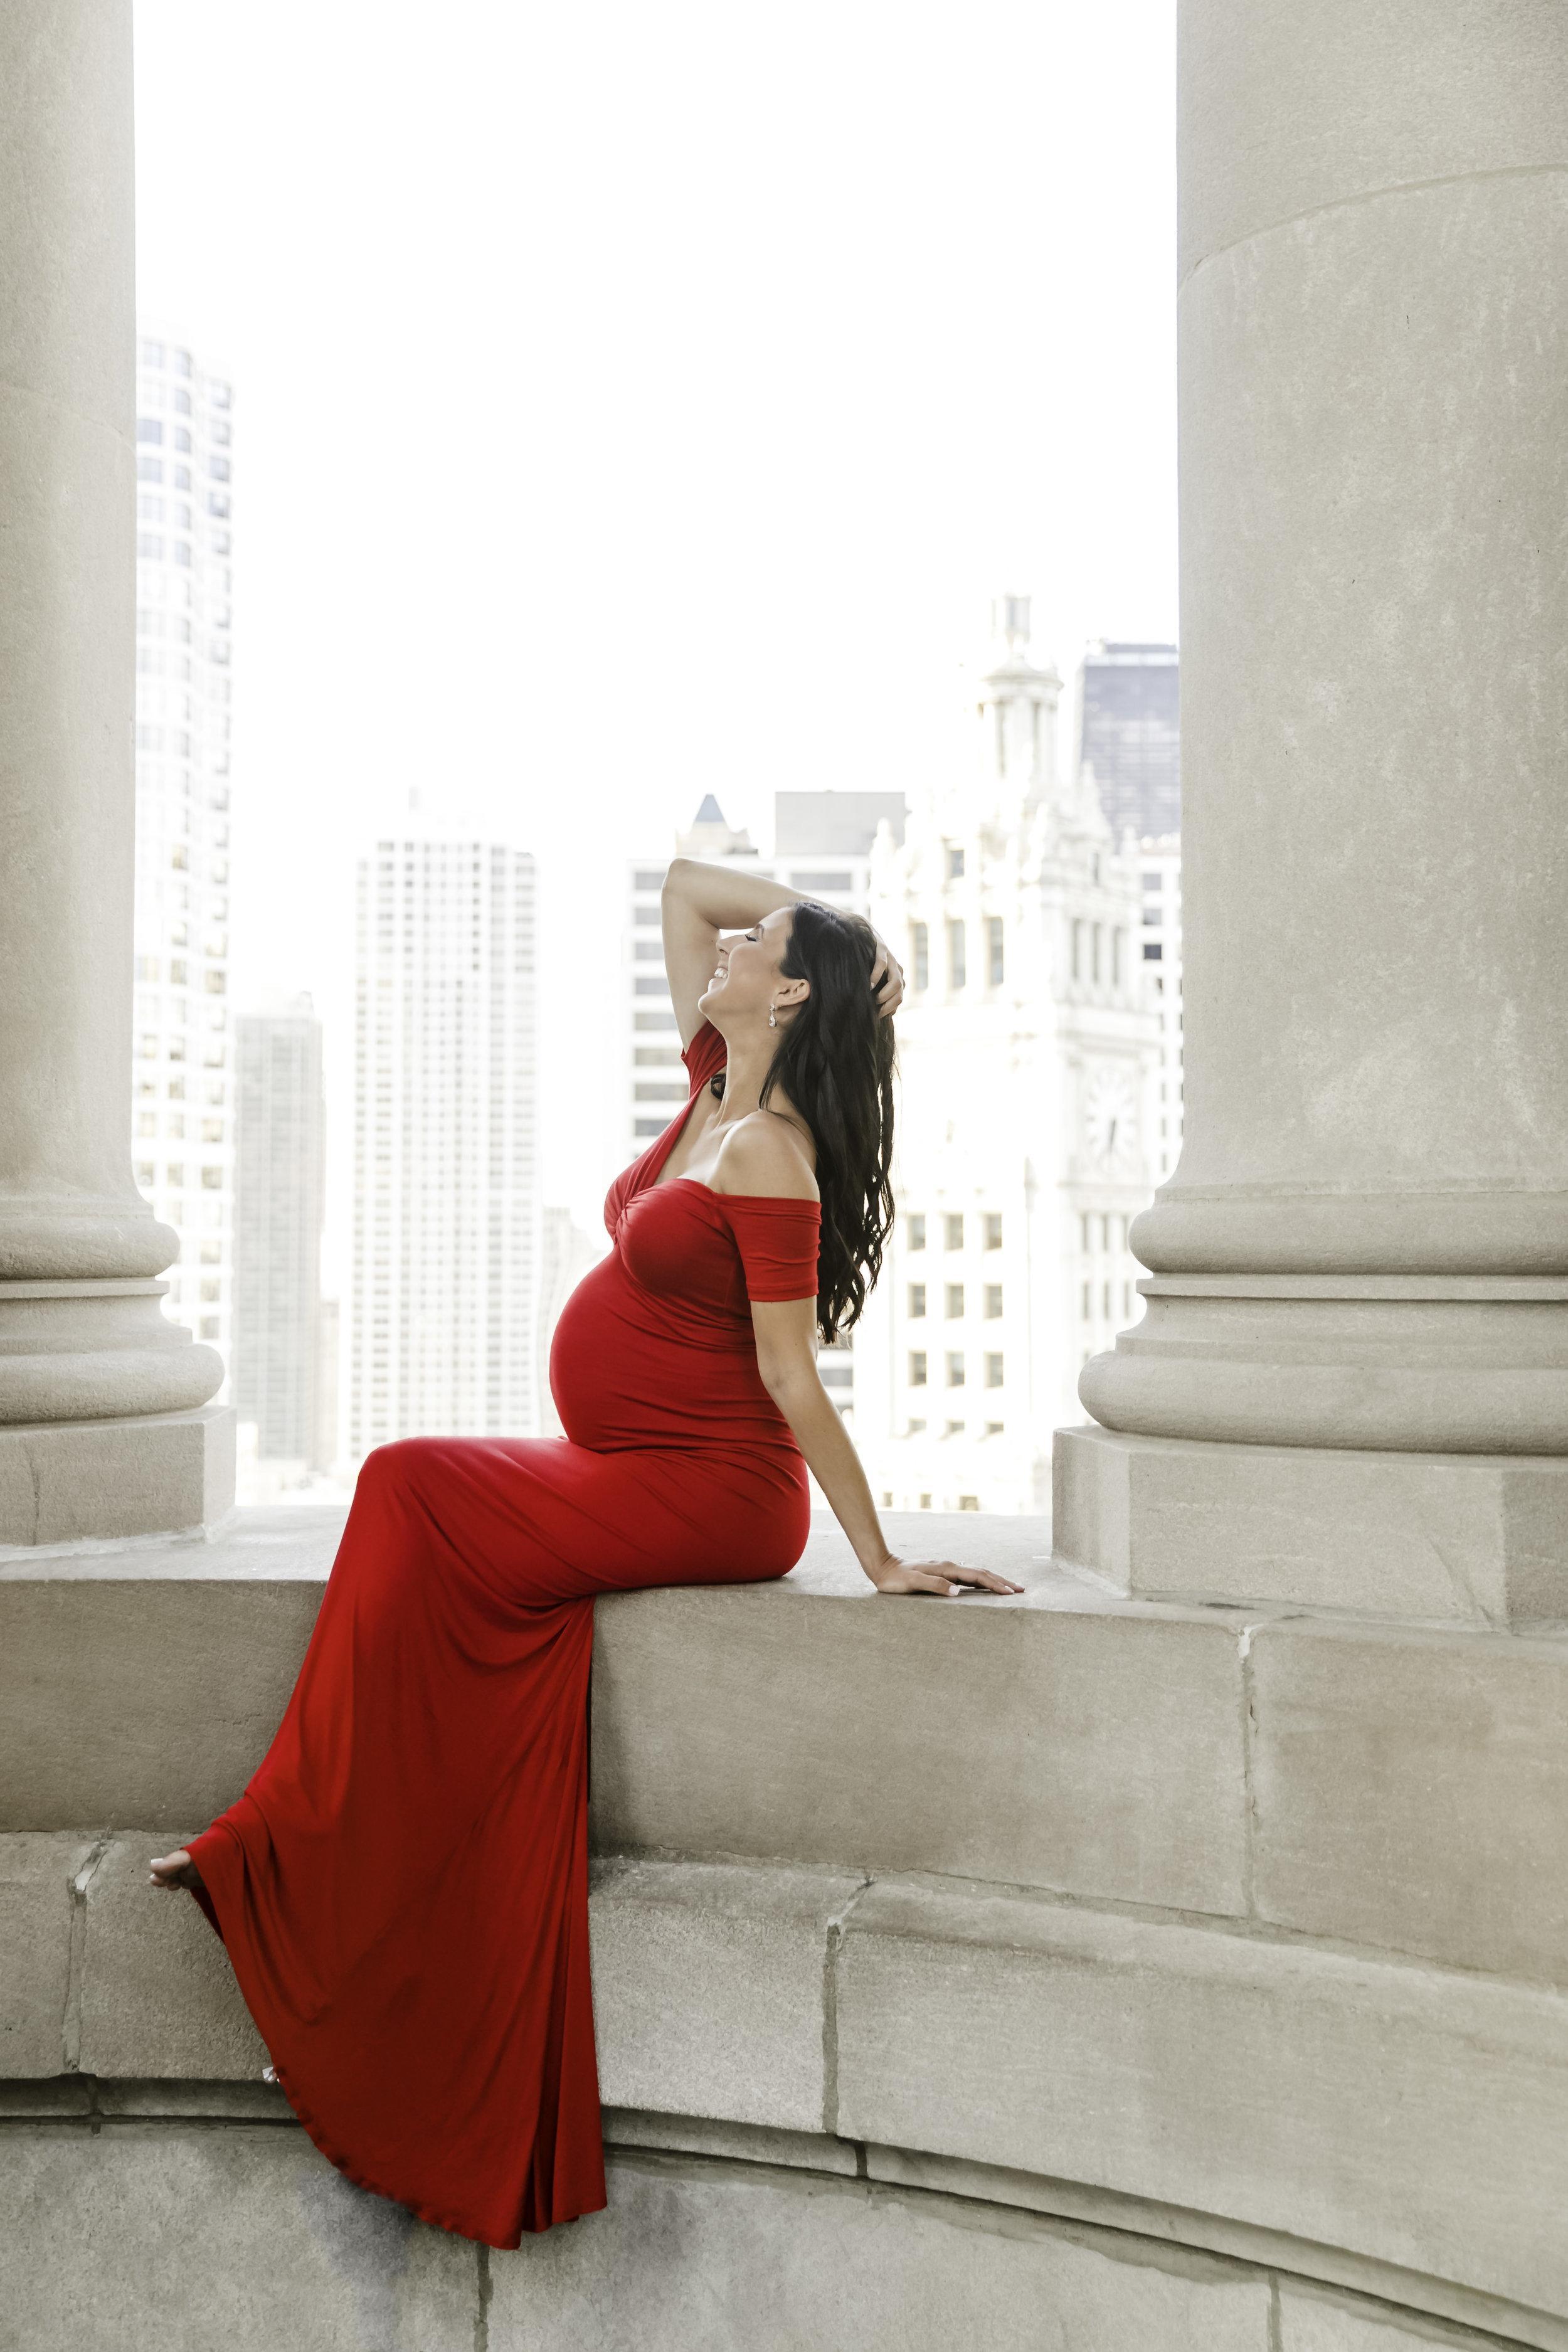 chicago london house maternity lifestyle photographer jenny grimm photography